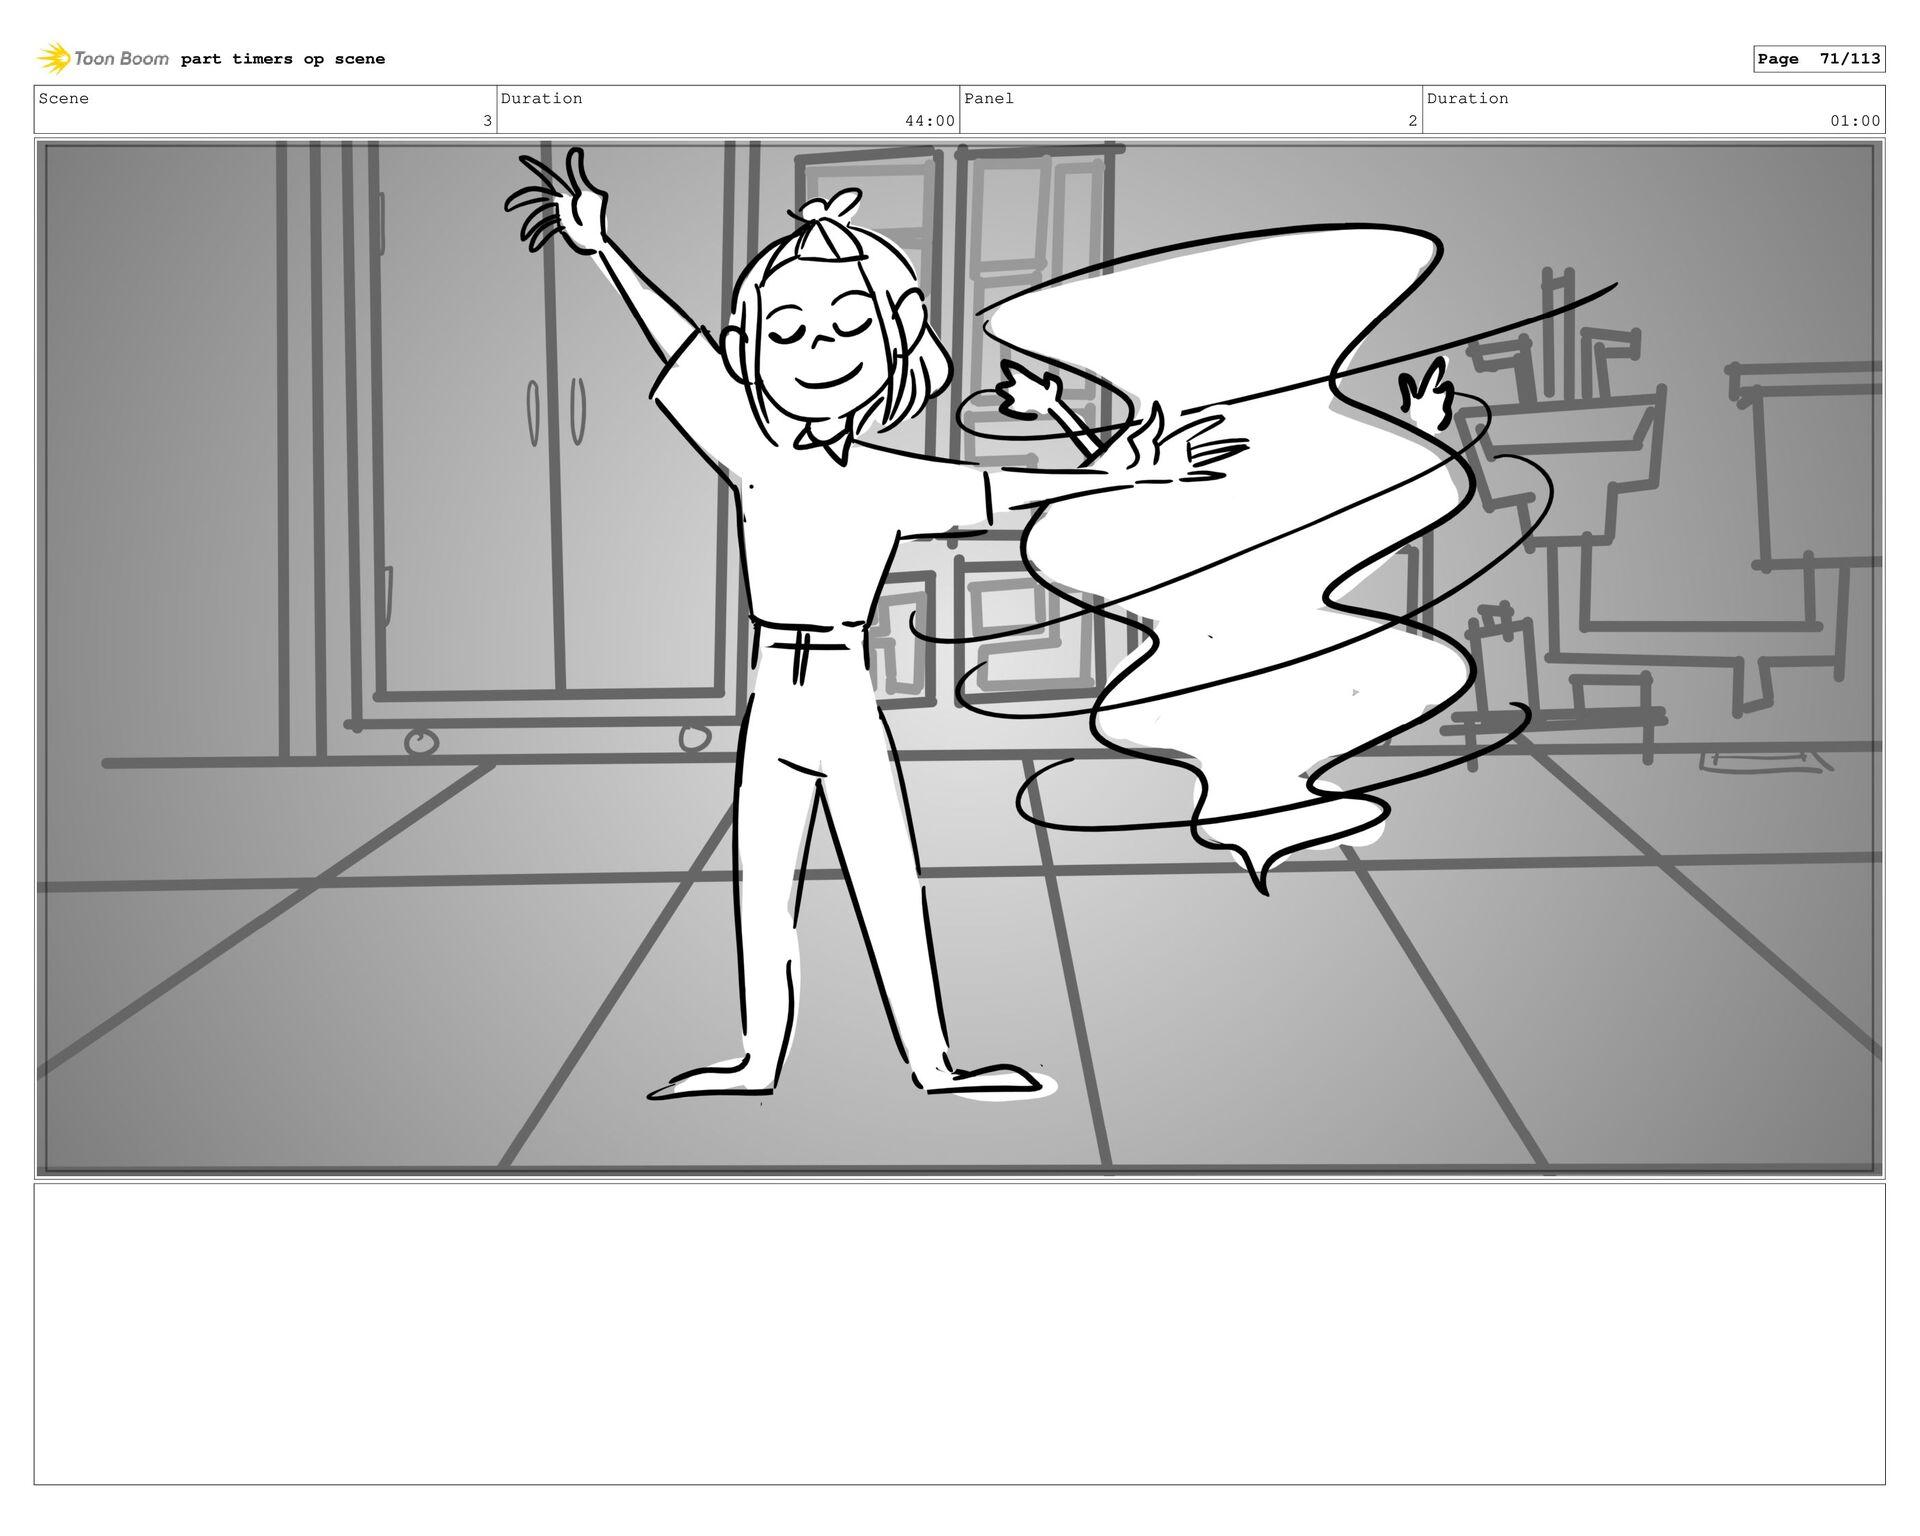 Scene 3 Duration 44:00 Panel 39 Duration 01:00 ...